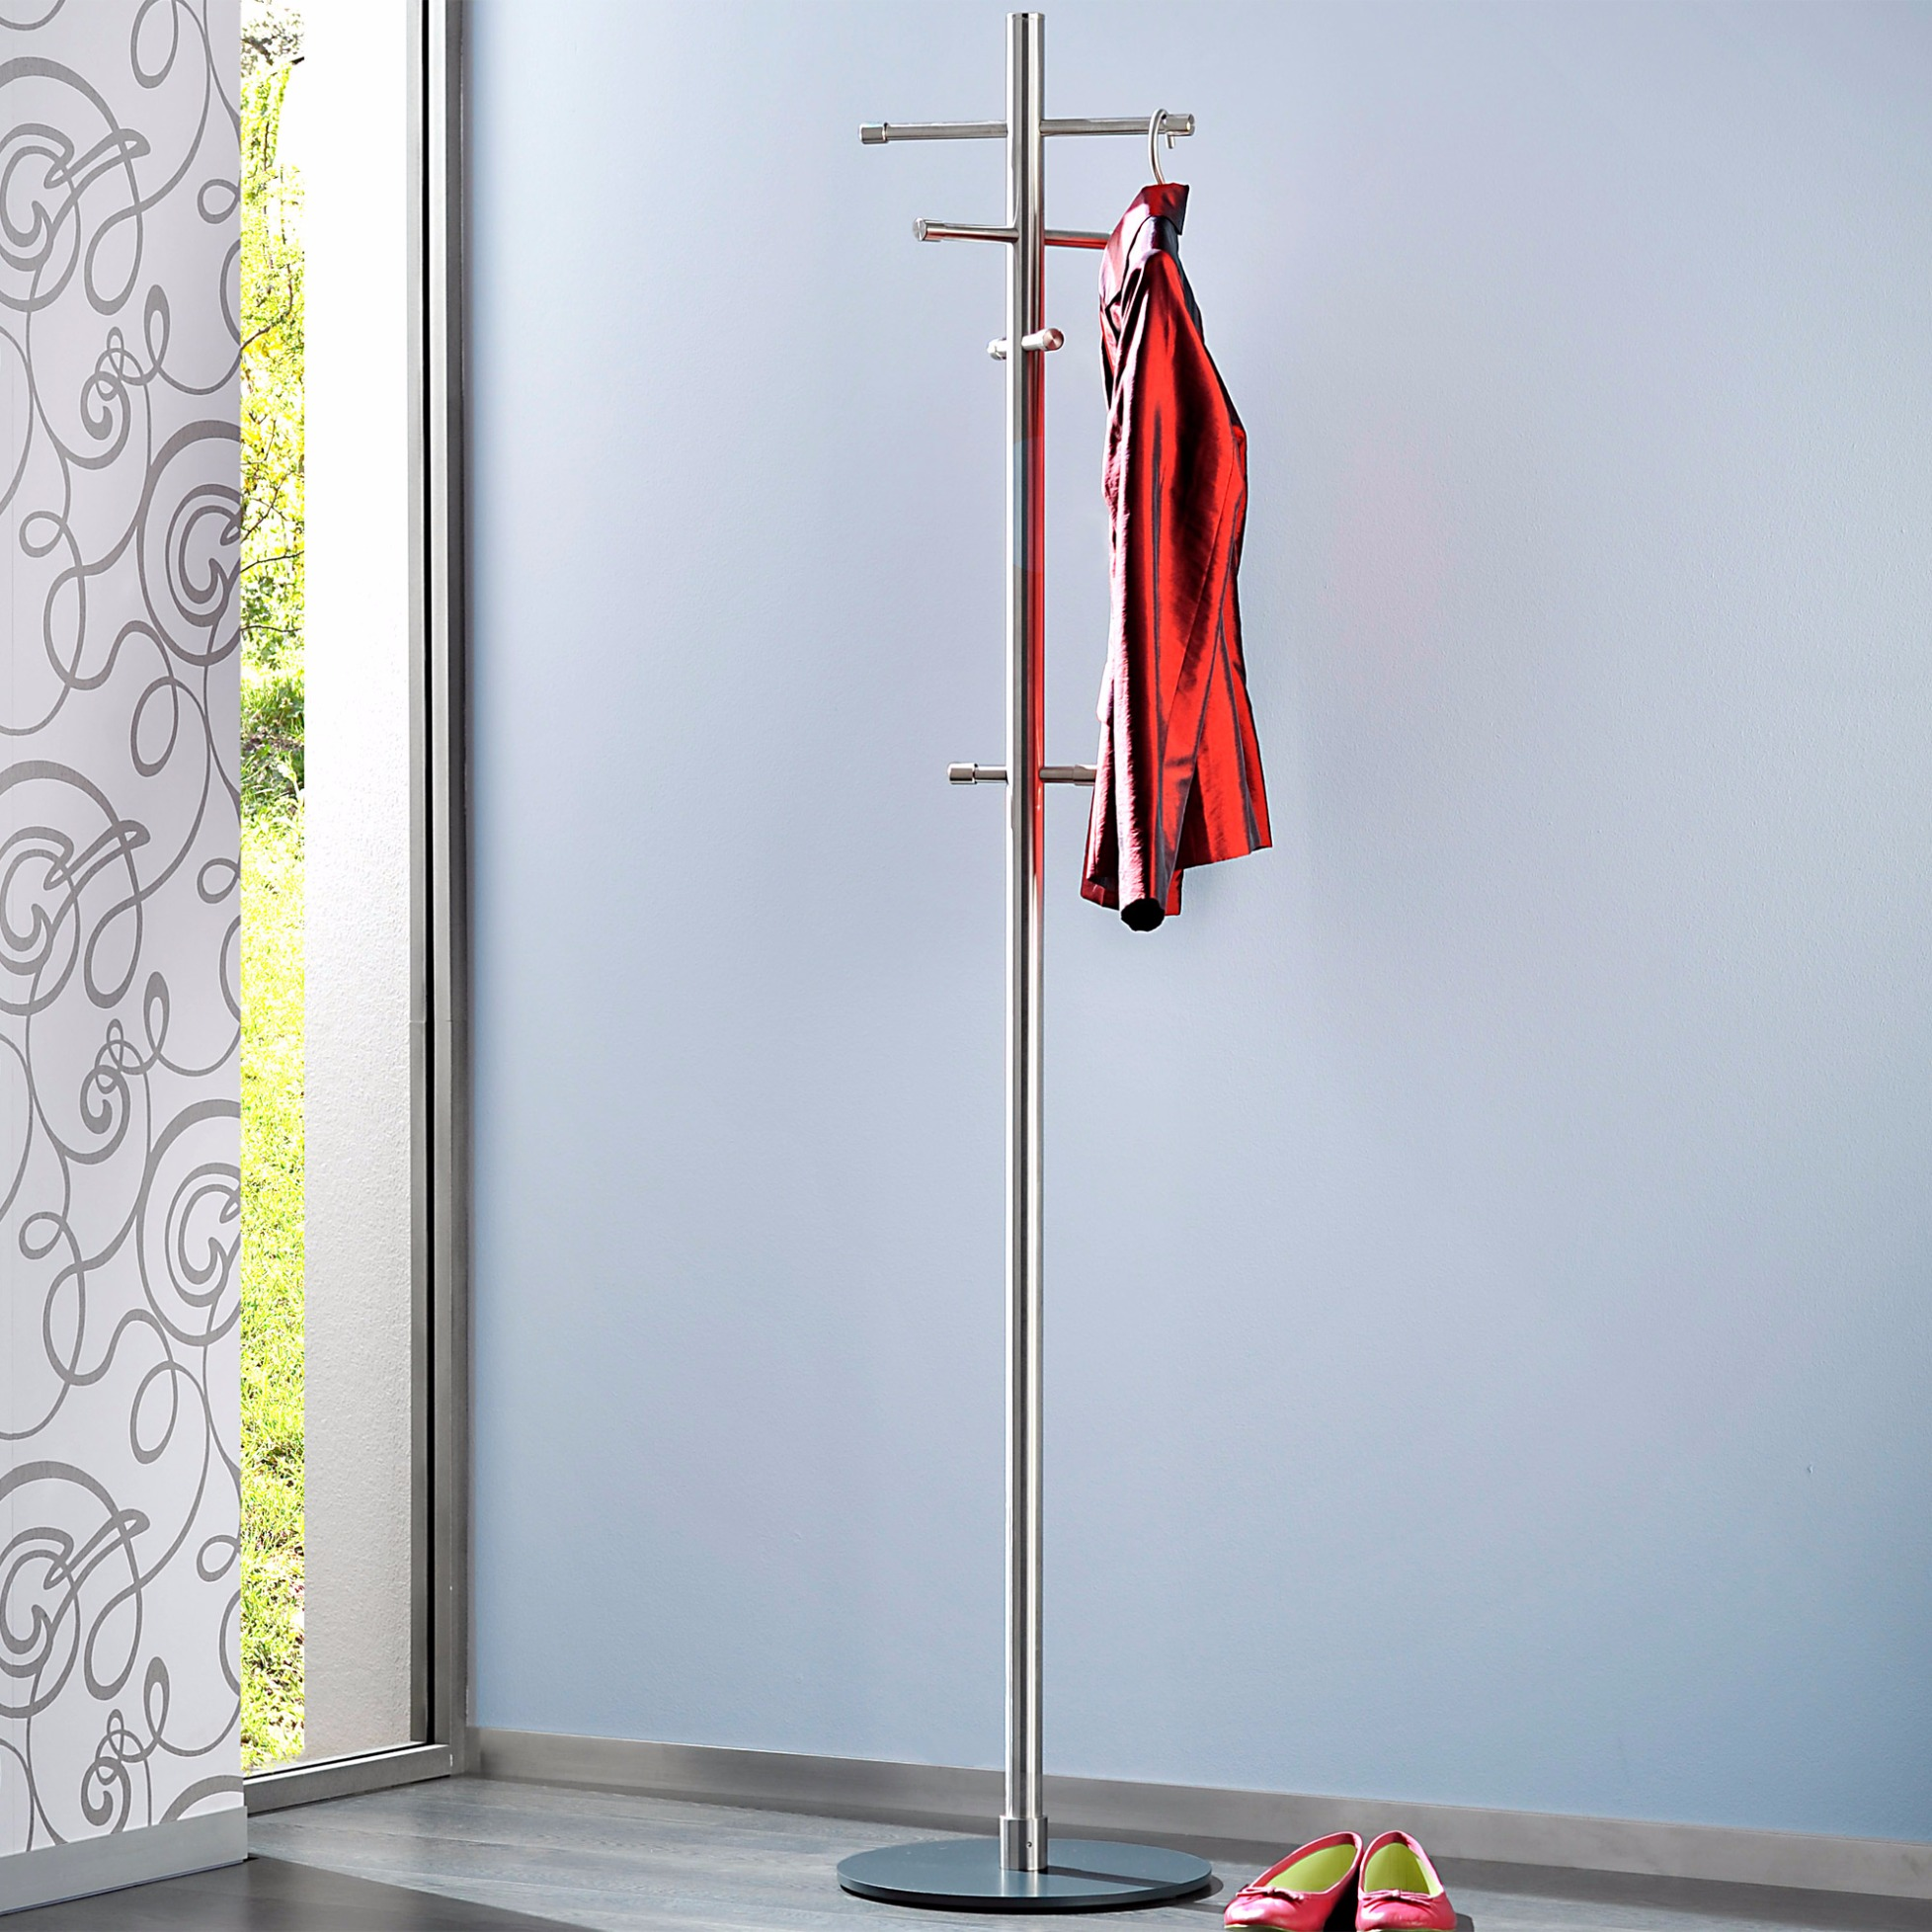 standgarderobe pur von d tec. Black Bedroom Furniture Sets. Home Design Ideas